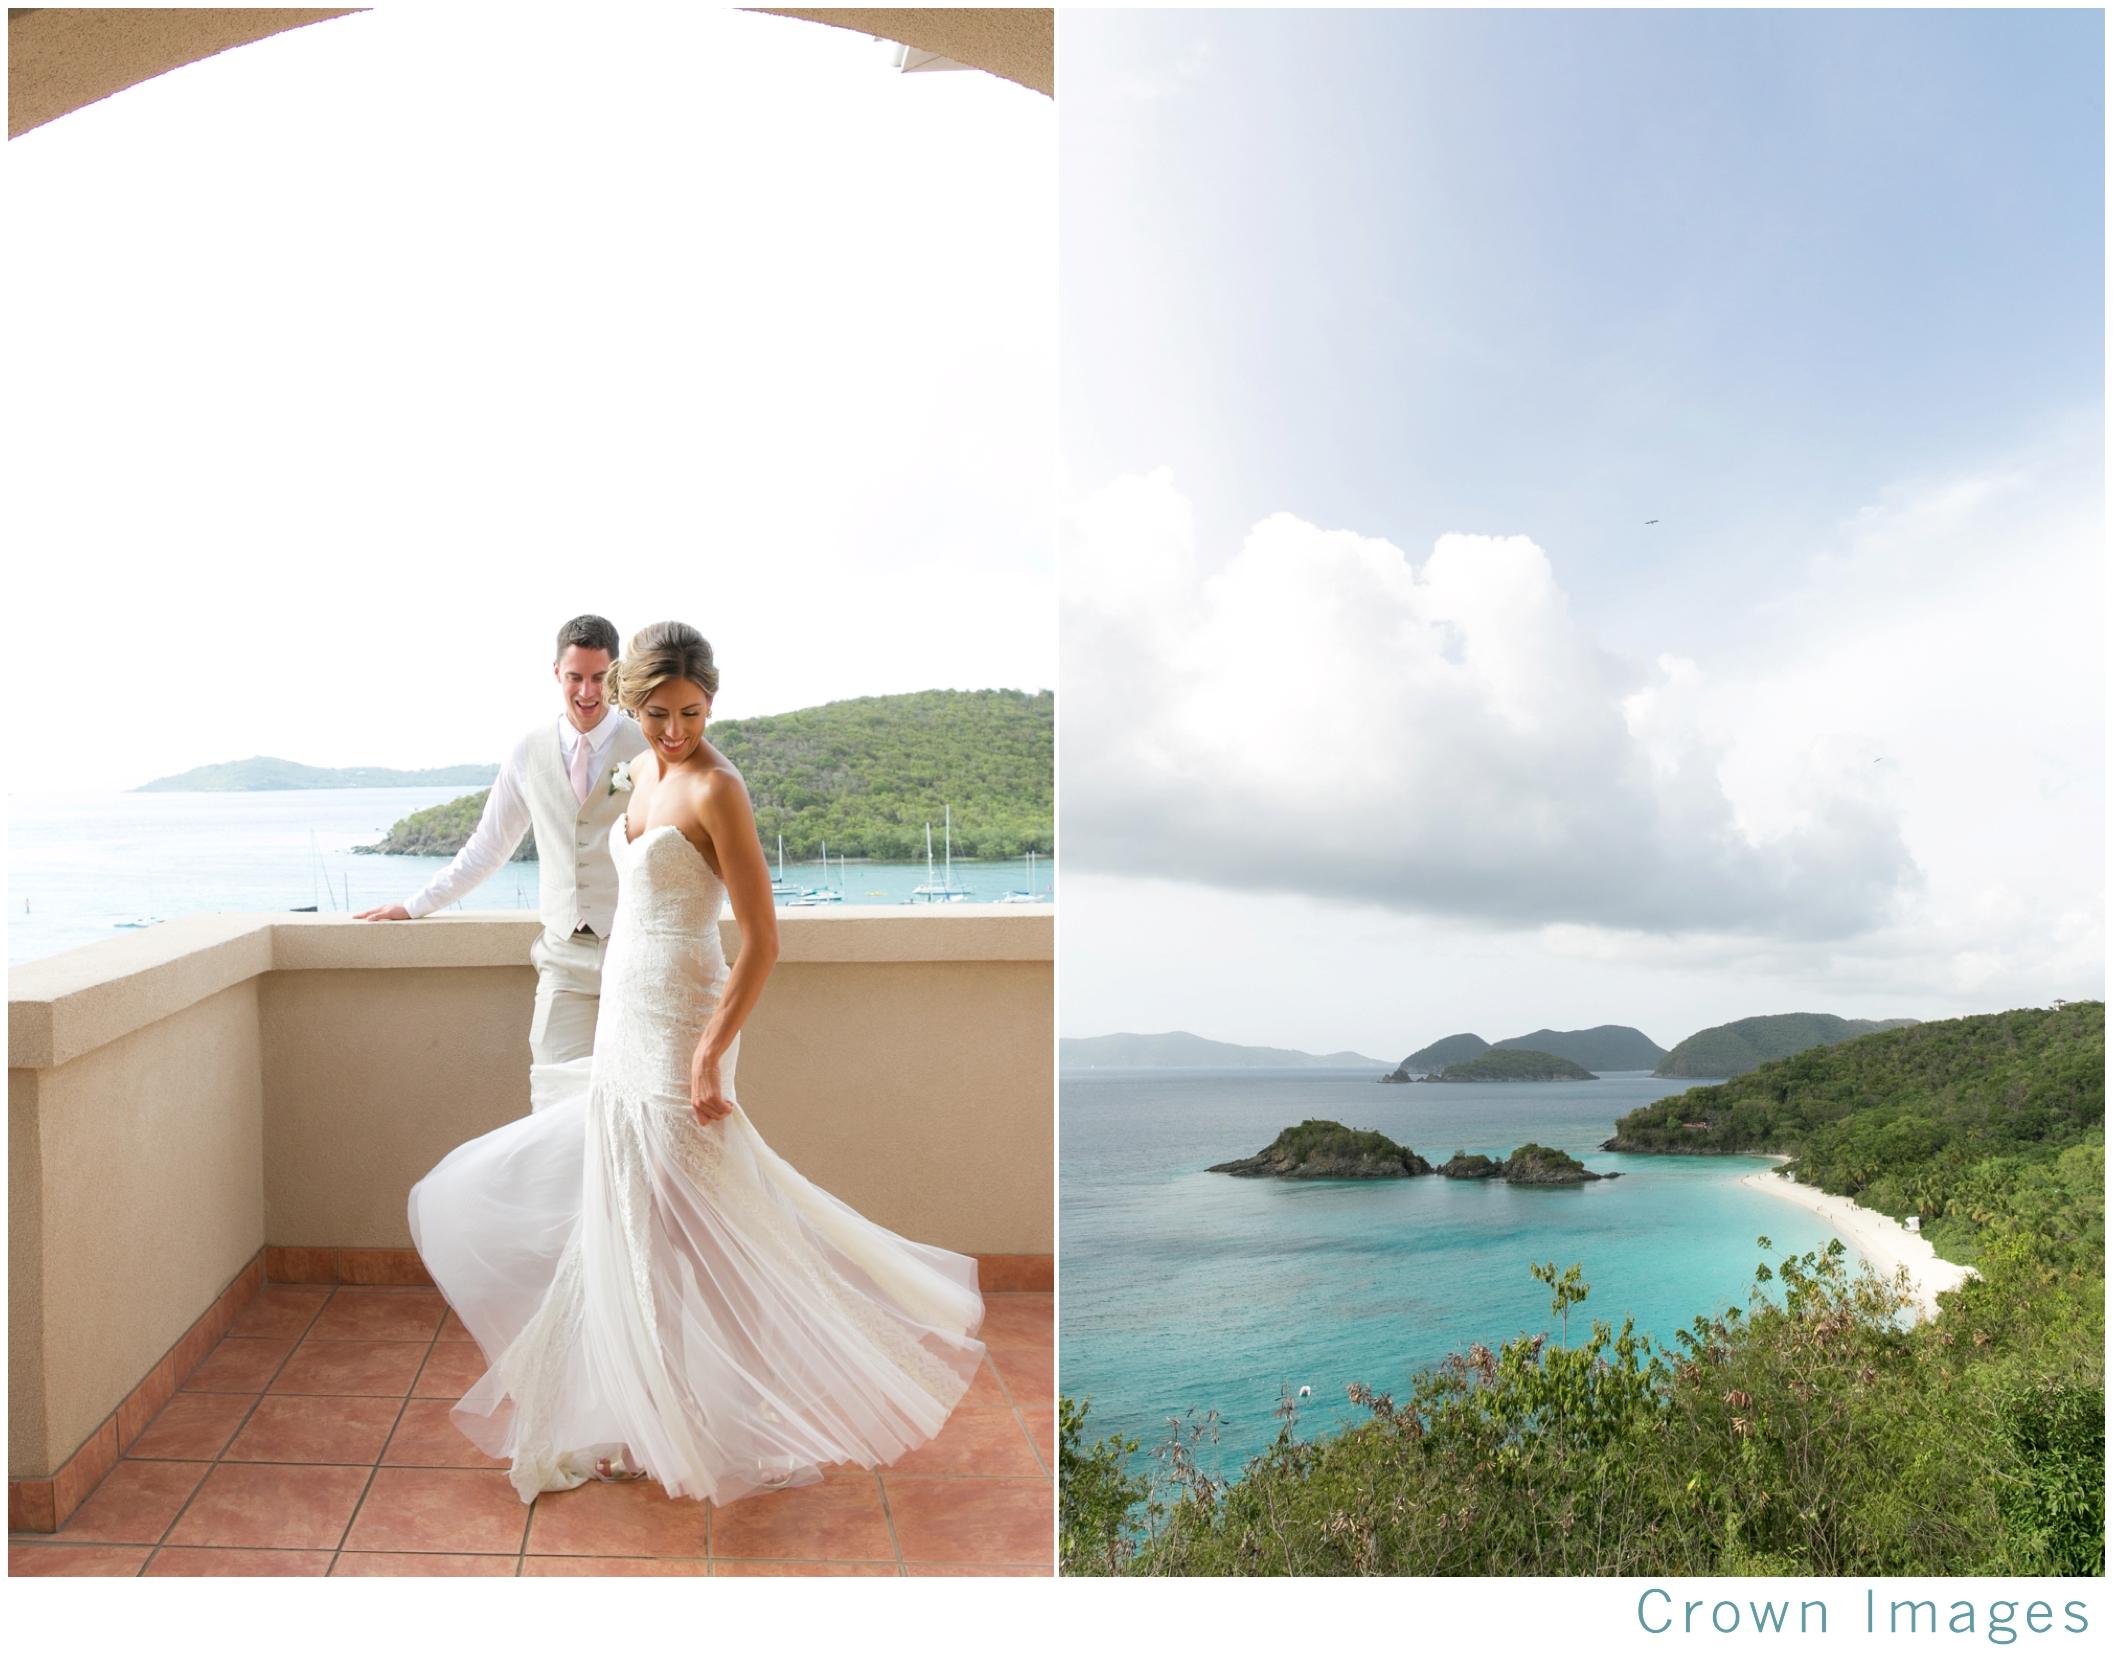 wedding photos crown images_1665.jpg